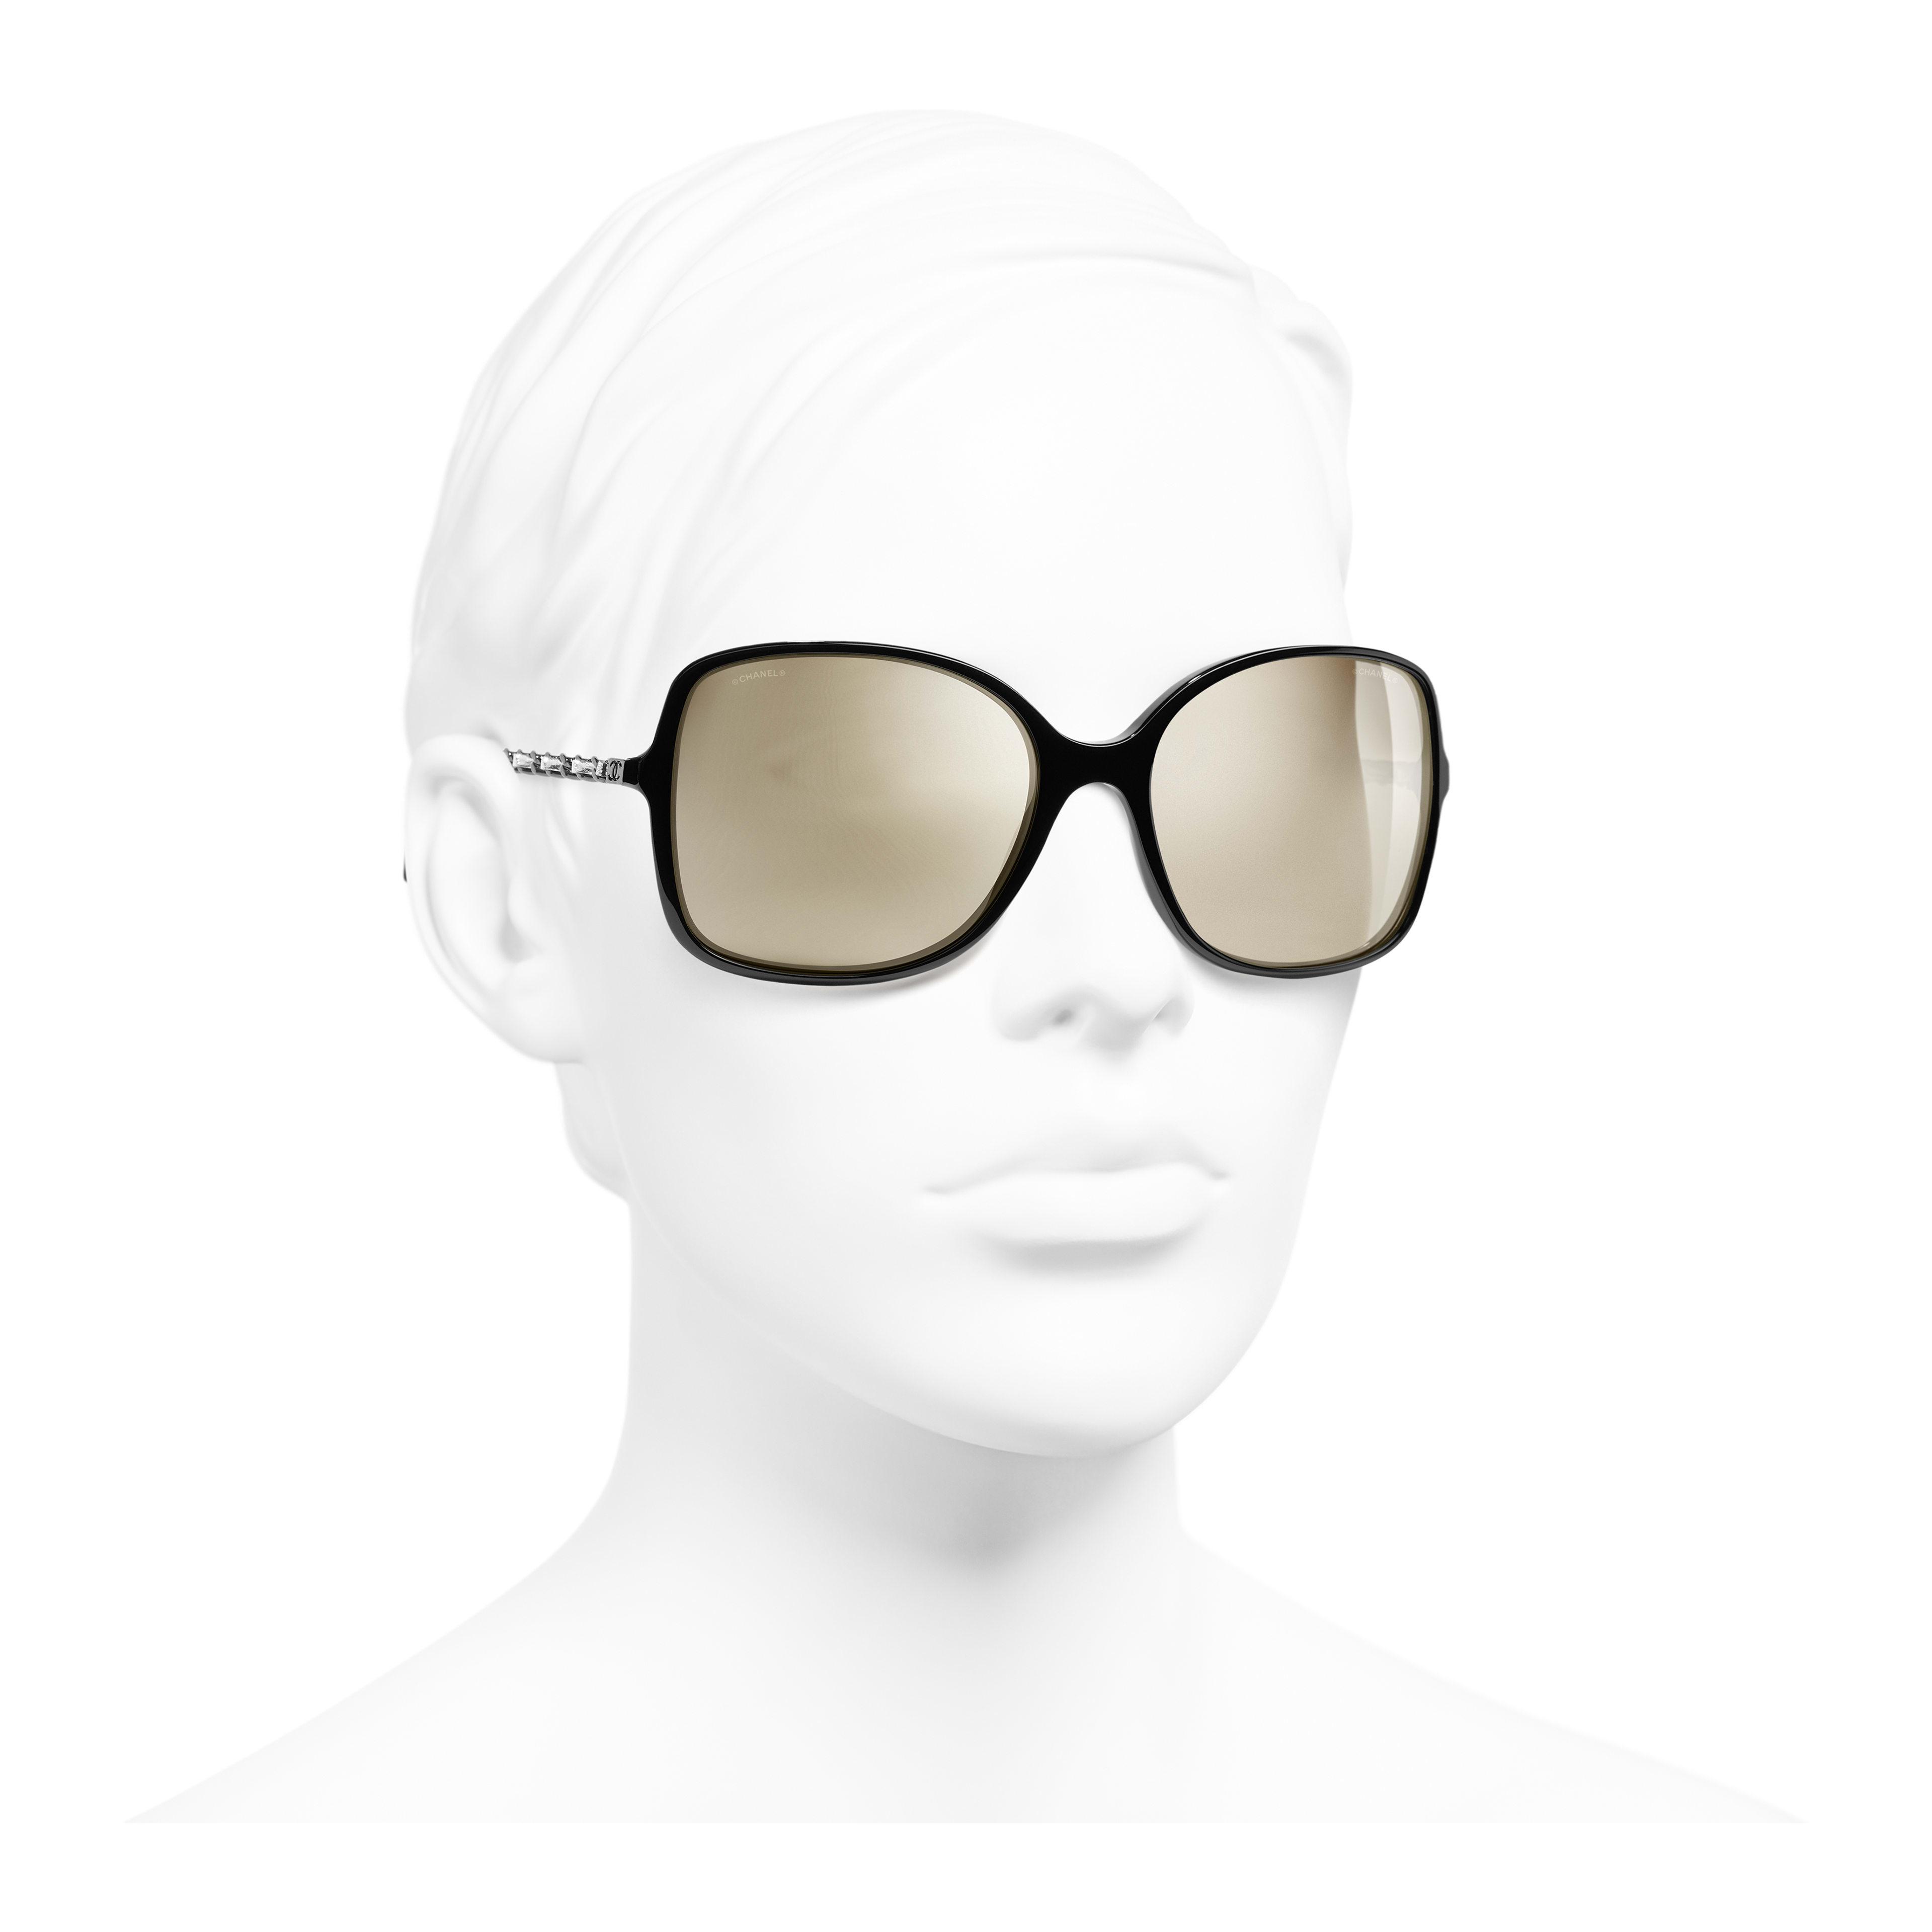 Square Sunglasses - Black - Acetate & Lambskin - Gold Lenses - Worn 3/4 view - see full sized version